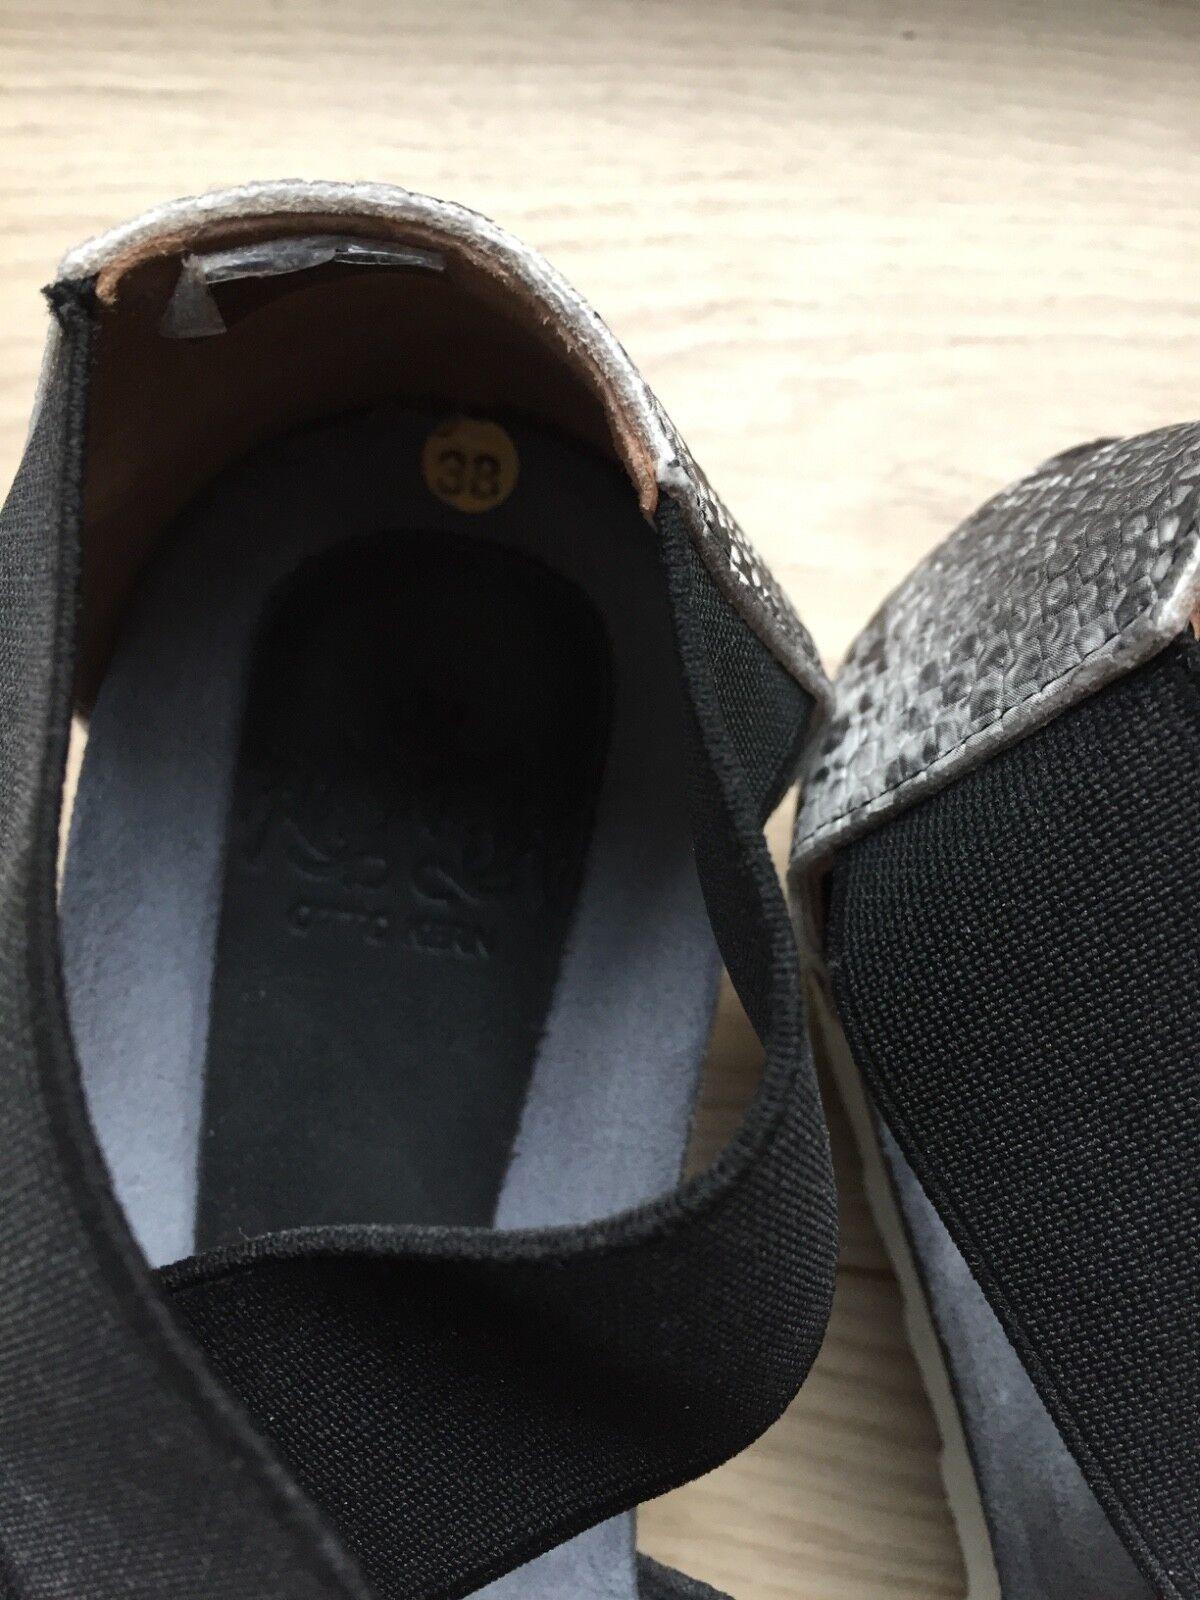 39 Gr. Stiefelies Stiefel Ankle Damen Stiefelette KERN OTTO